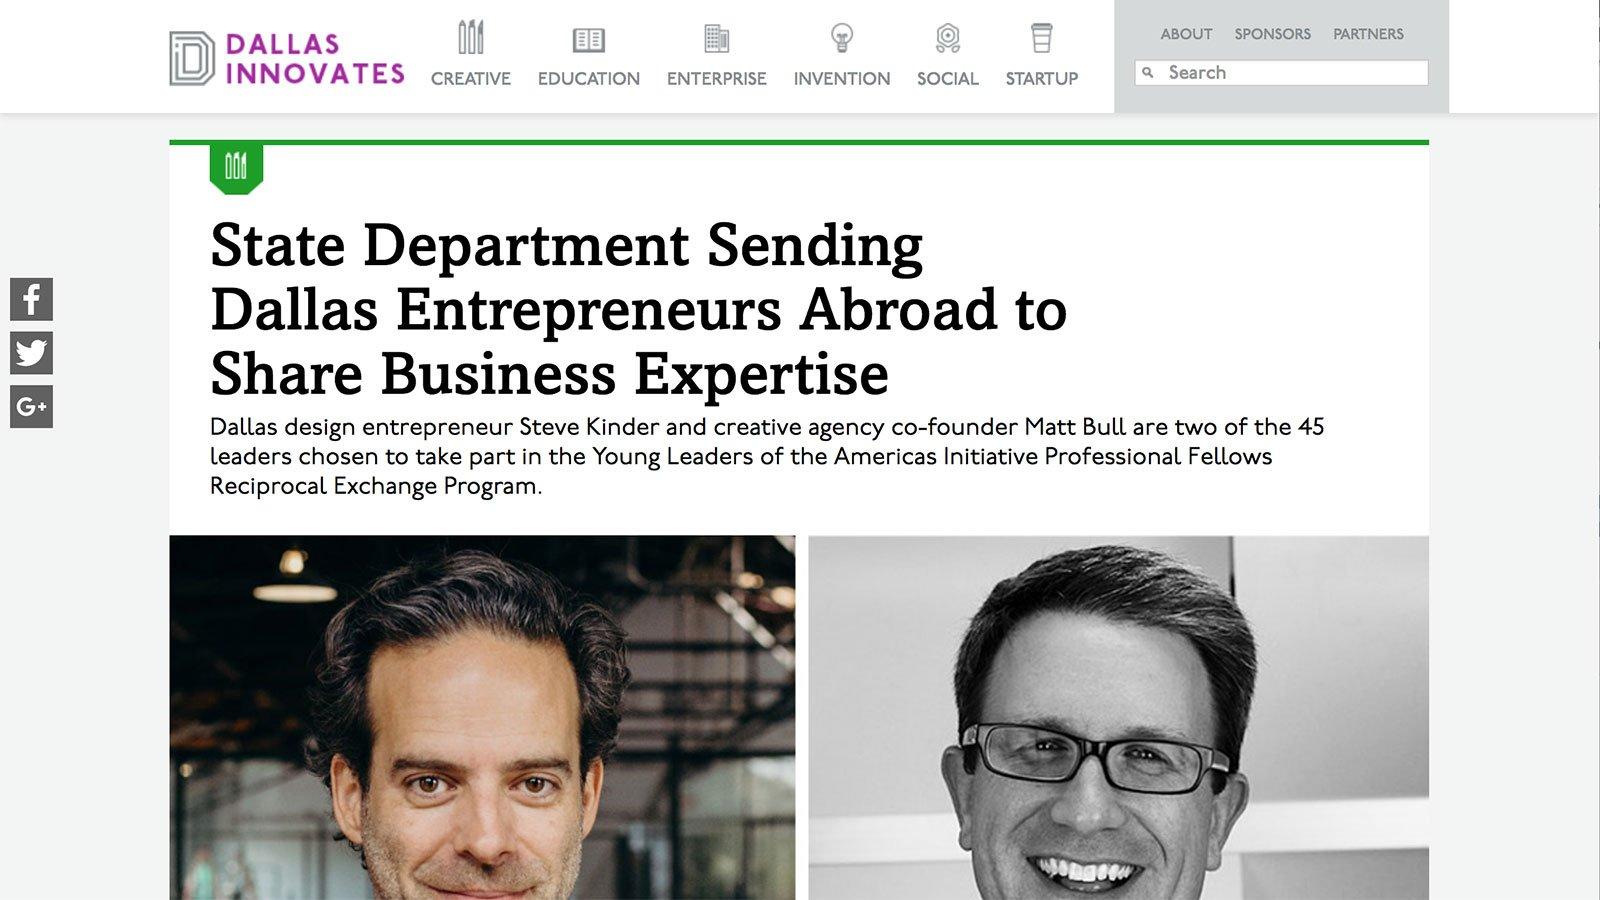 State Dept Sending Entrepreneurs Abroad to Share Expertise